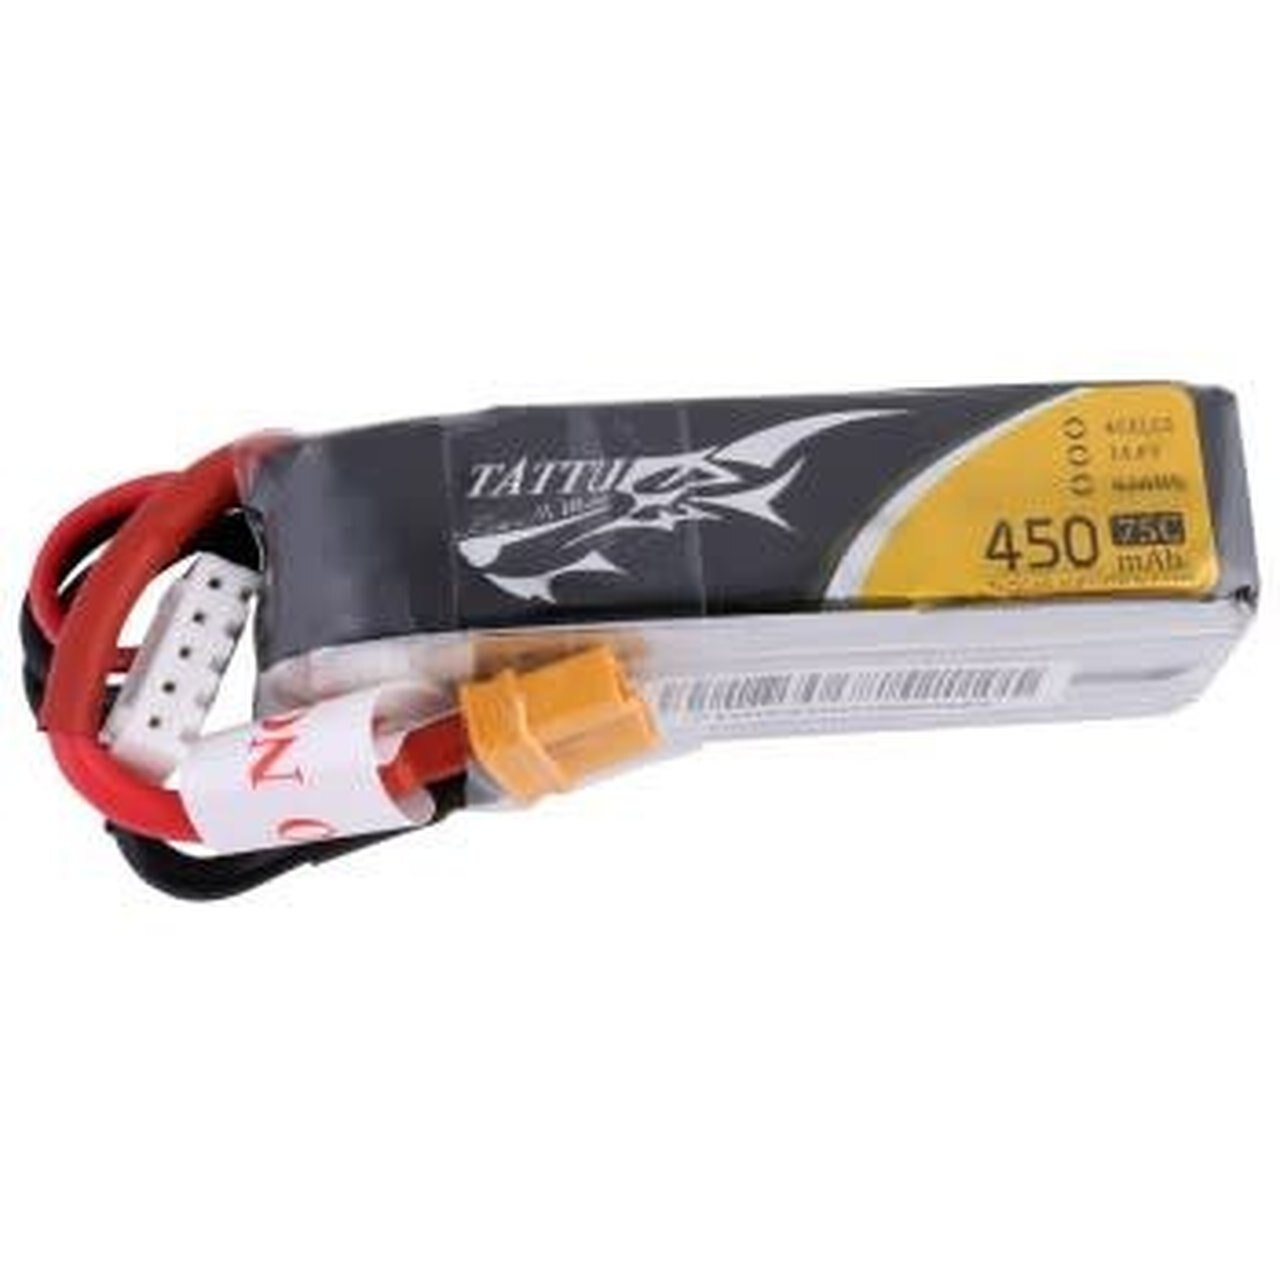 Tattu 450mAh 14.8V 75C 4S1P Lipo Battery Pack with XT30 plug - Long Size for H Frame